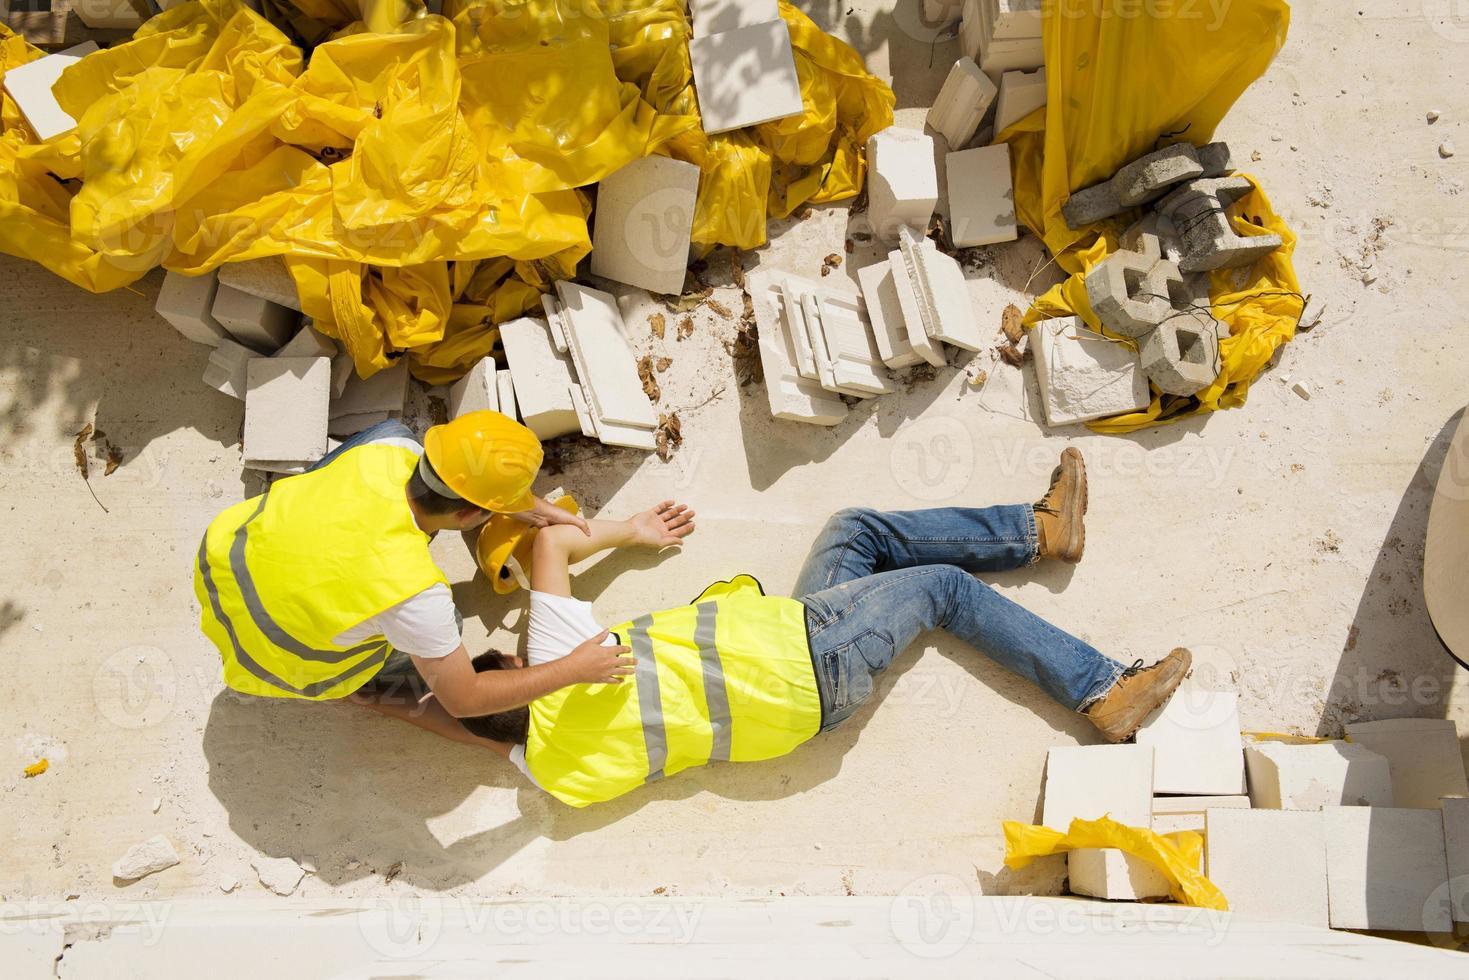 Construction accident photo